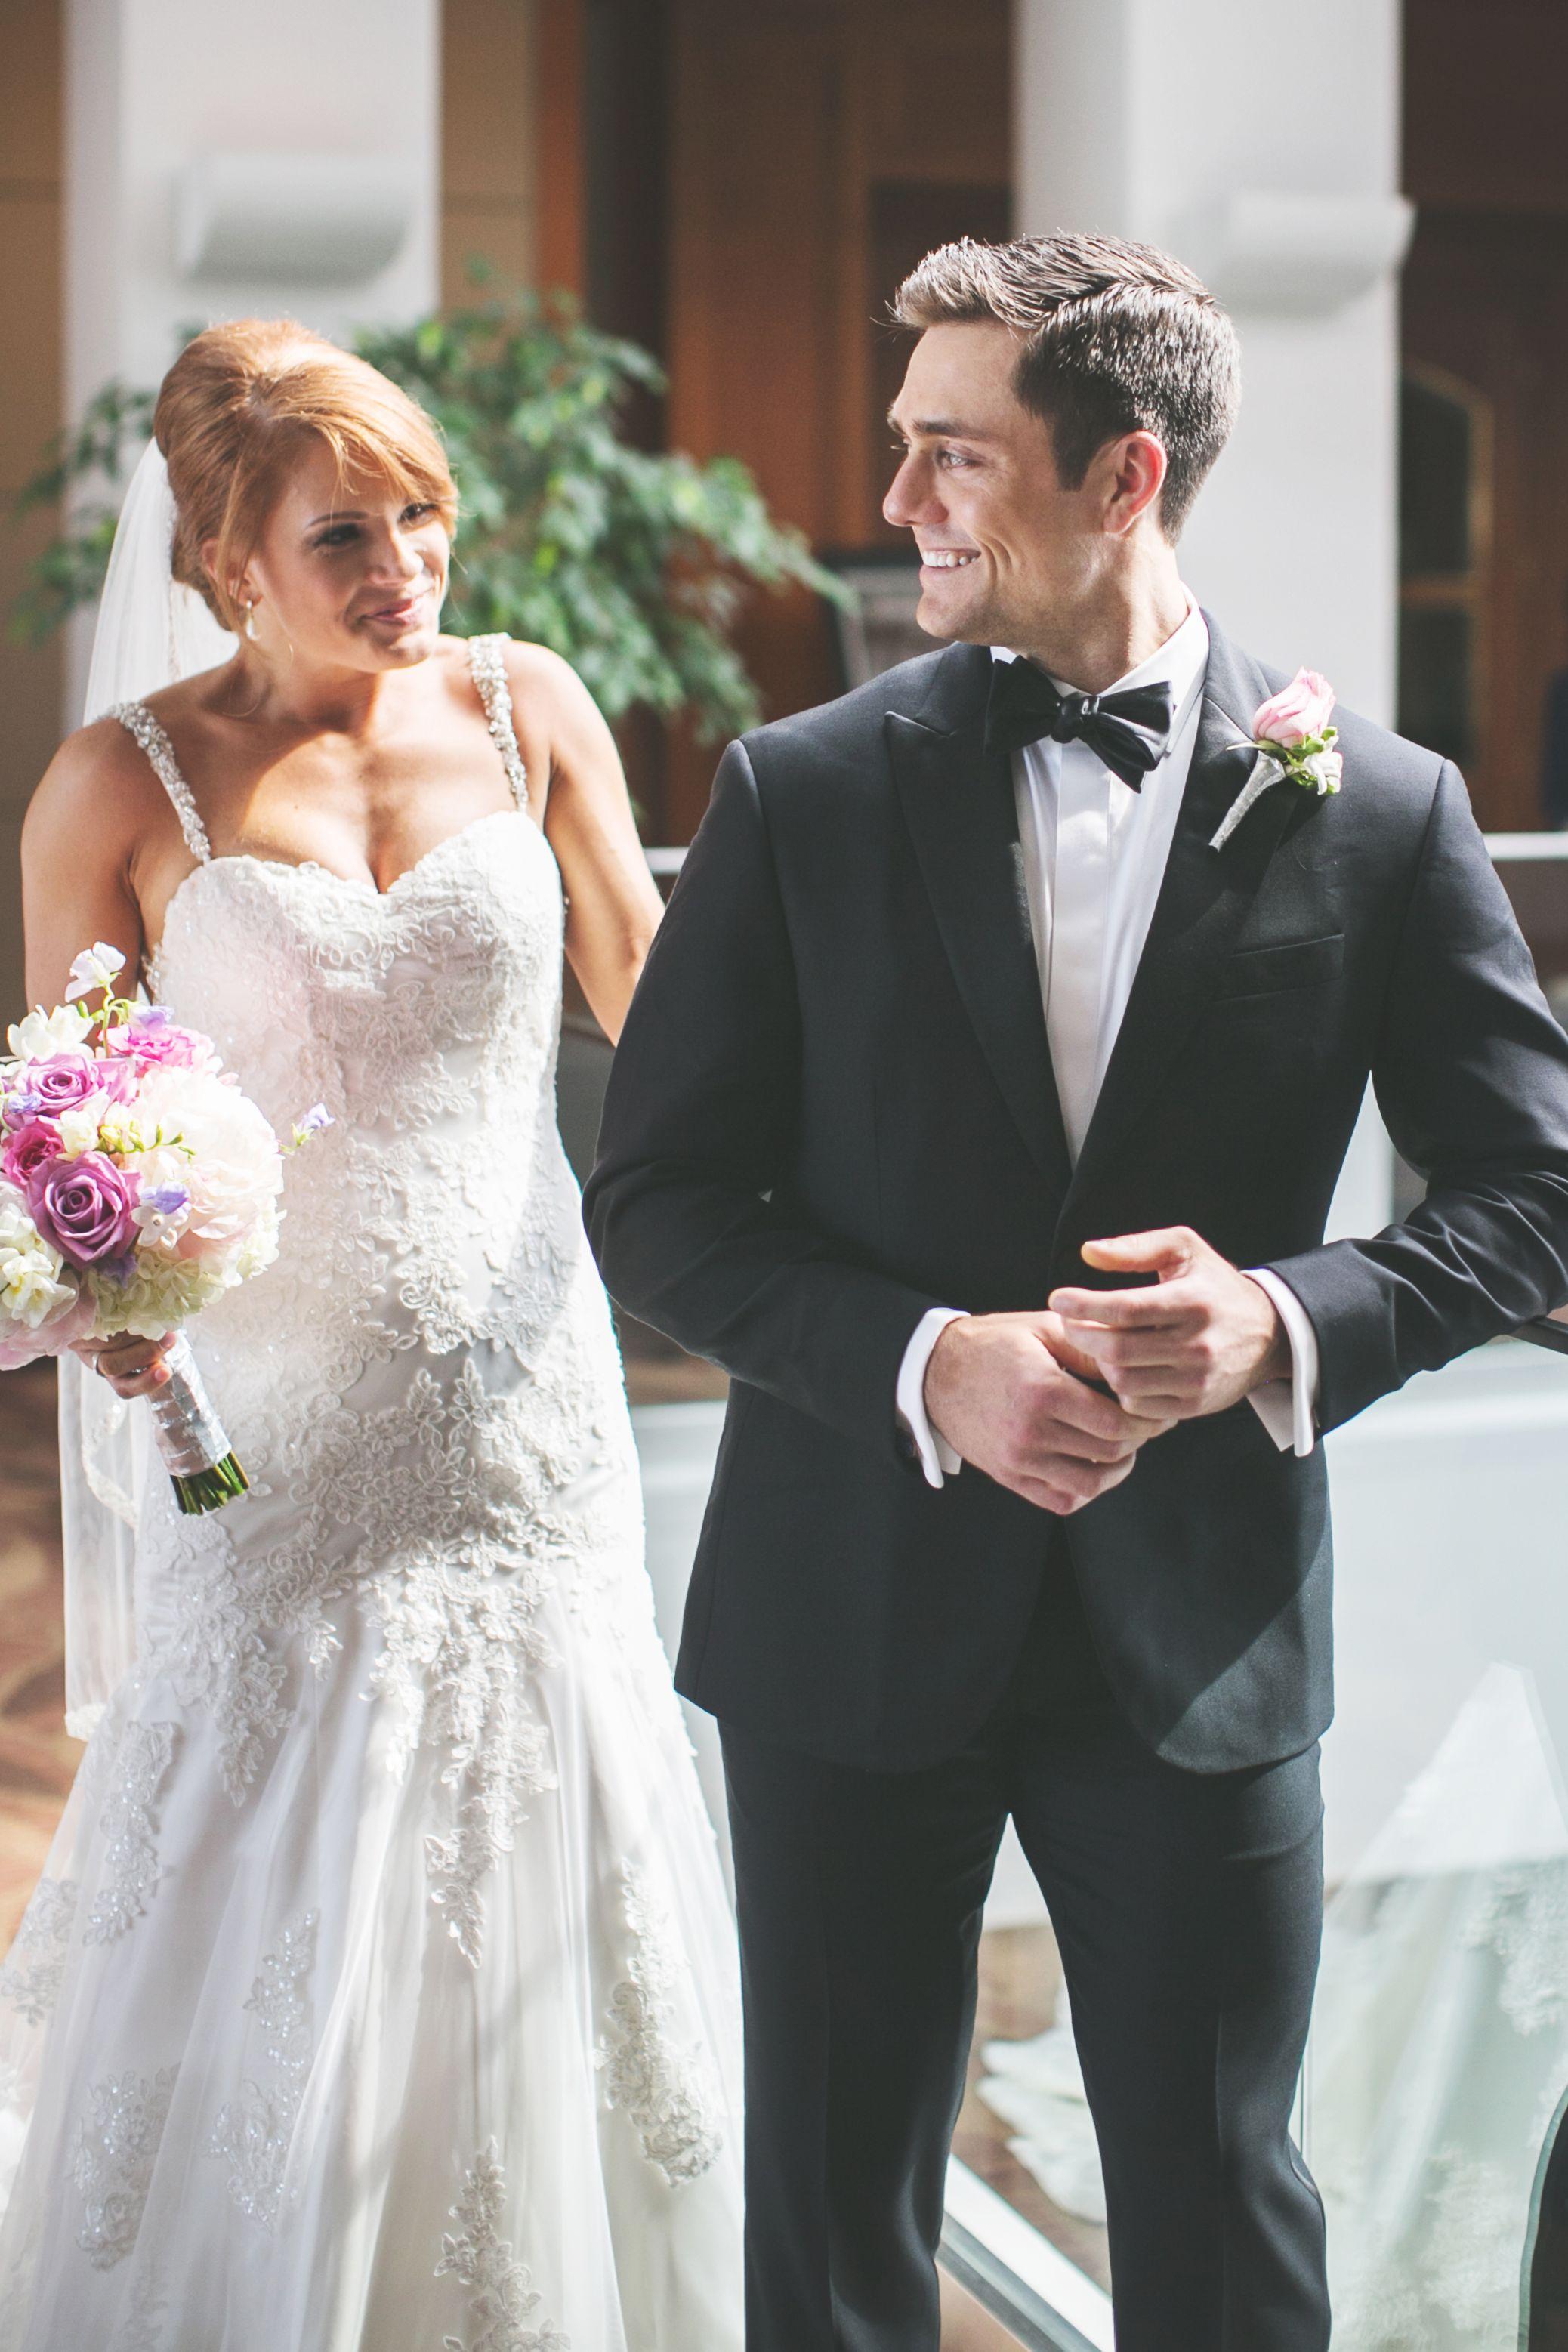 eephotome.alex.justin.wedding-25.jpg